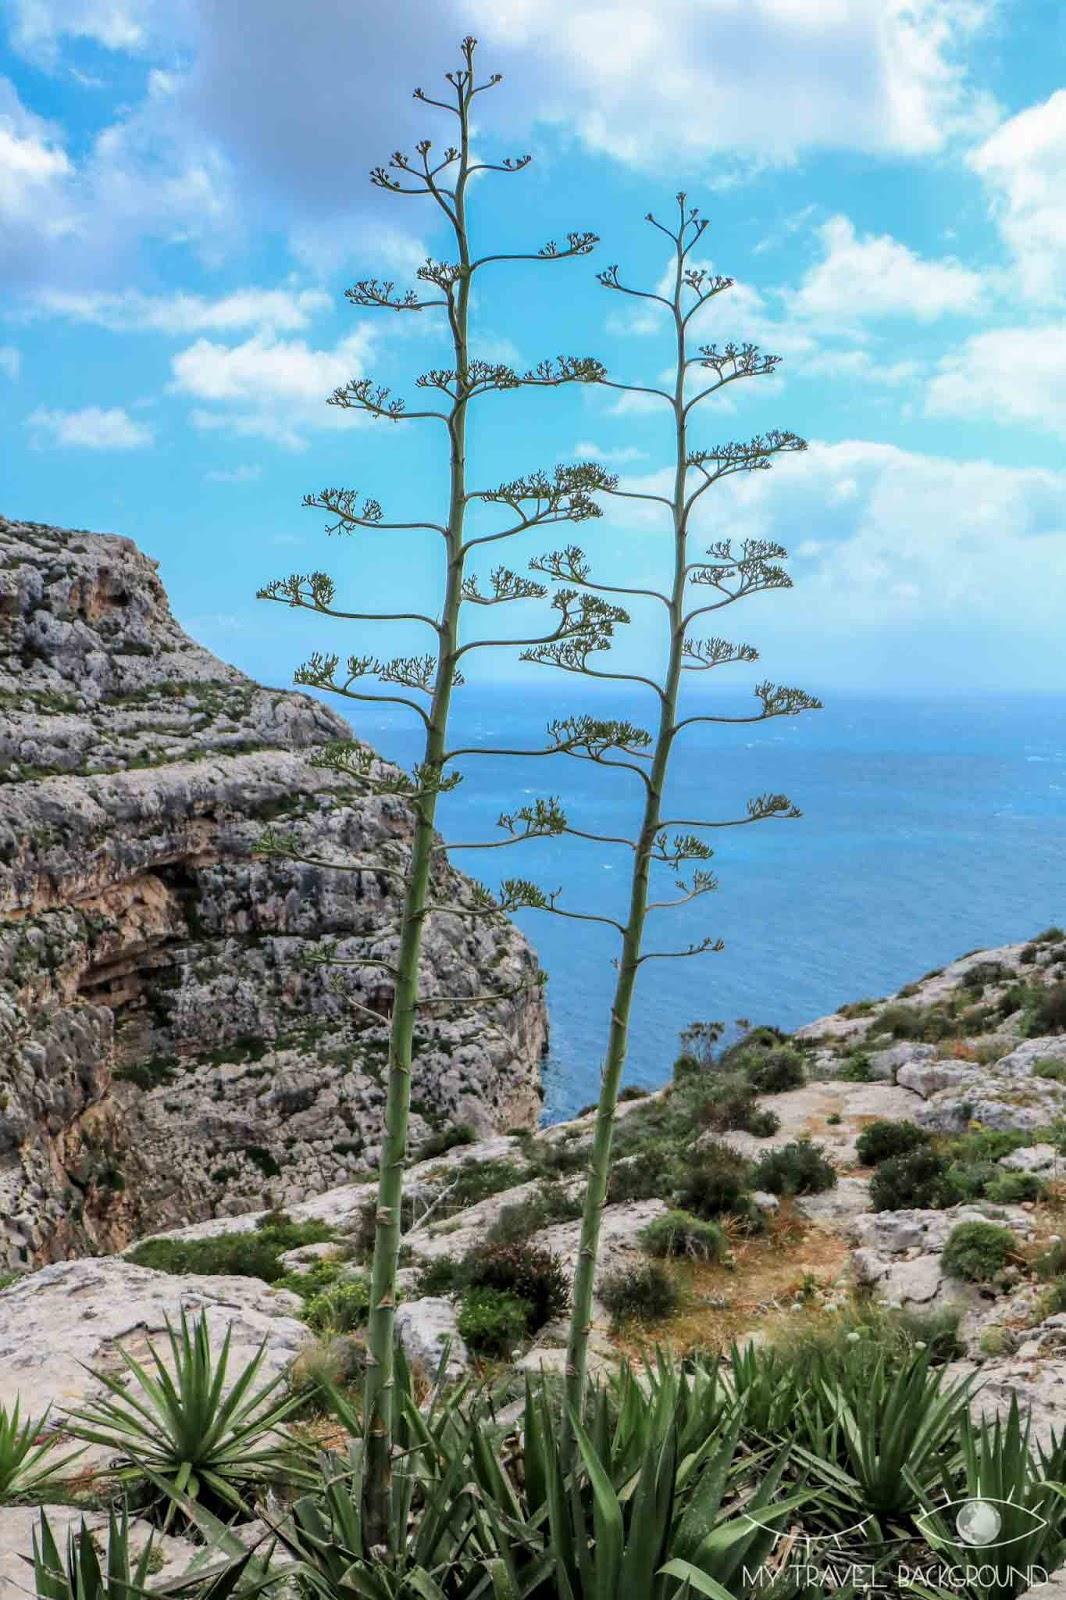 My Travel Bakground : voyage organisé à Malte, mon avis